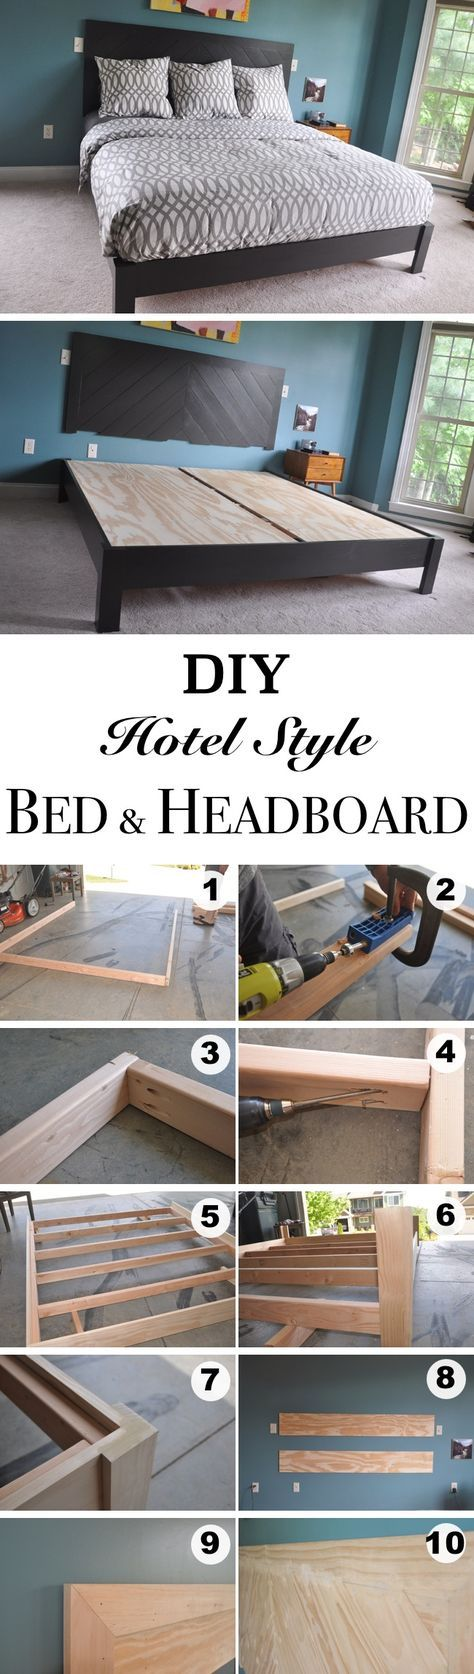 Easy diy bed headboard - Top 25 Best Diy Bed Headboard Ideas On Pinterest Creative Headboards Diy Headboards And Diy Headboards